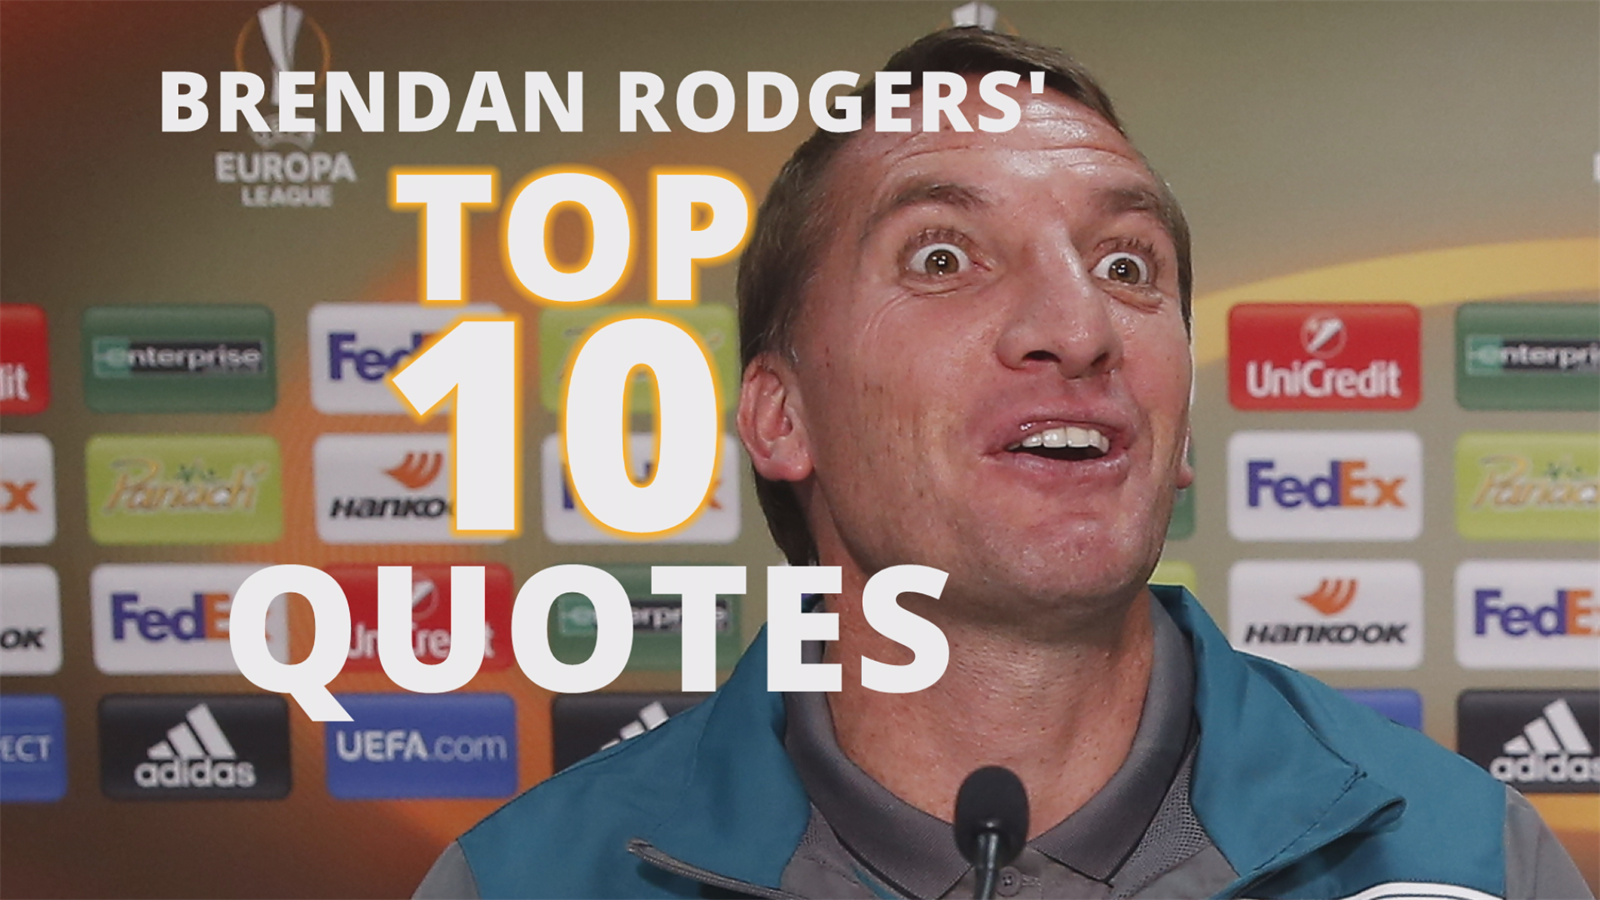 Ridiculous & hilarious Brendan Rodgers quotes - Top 10